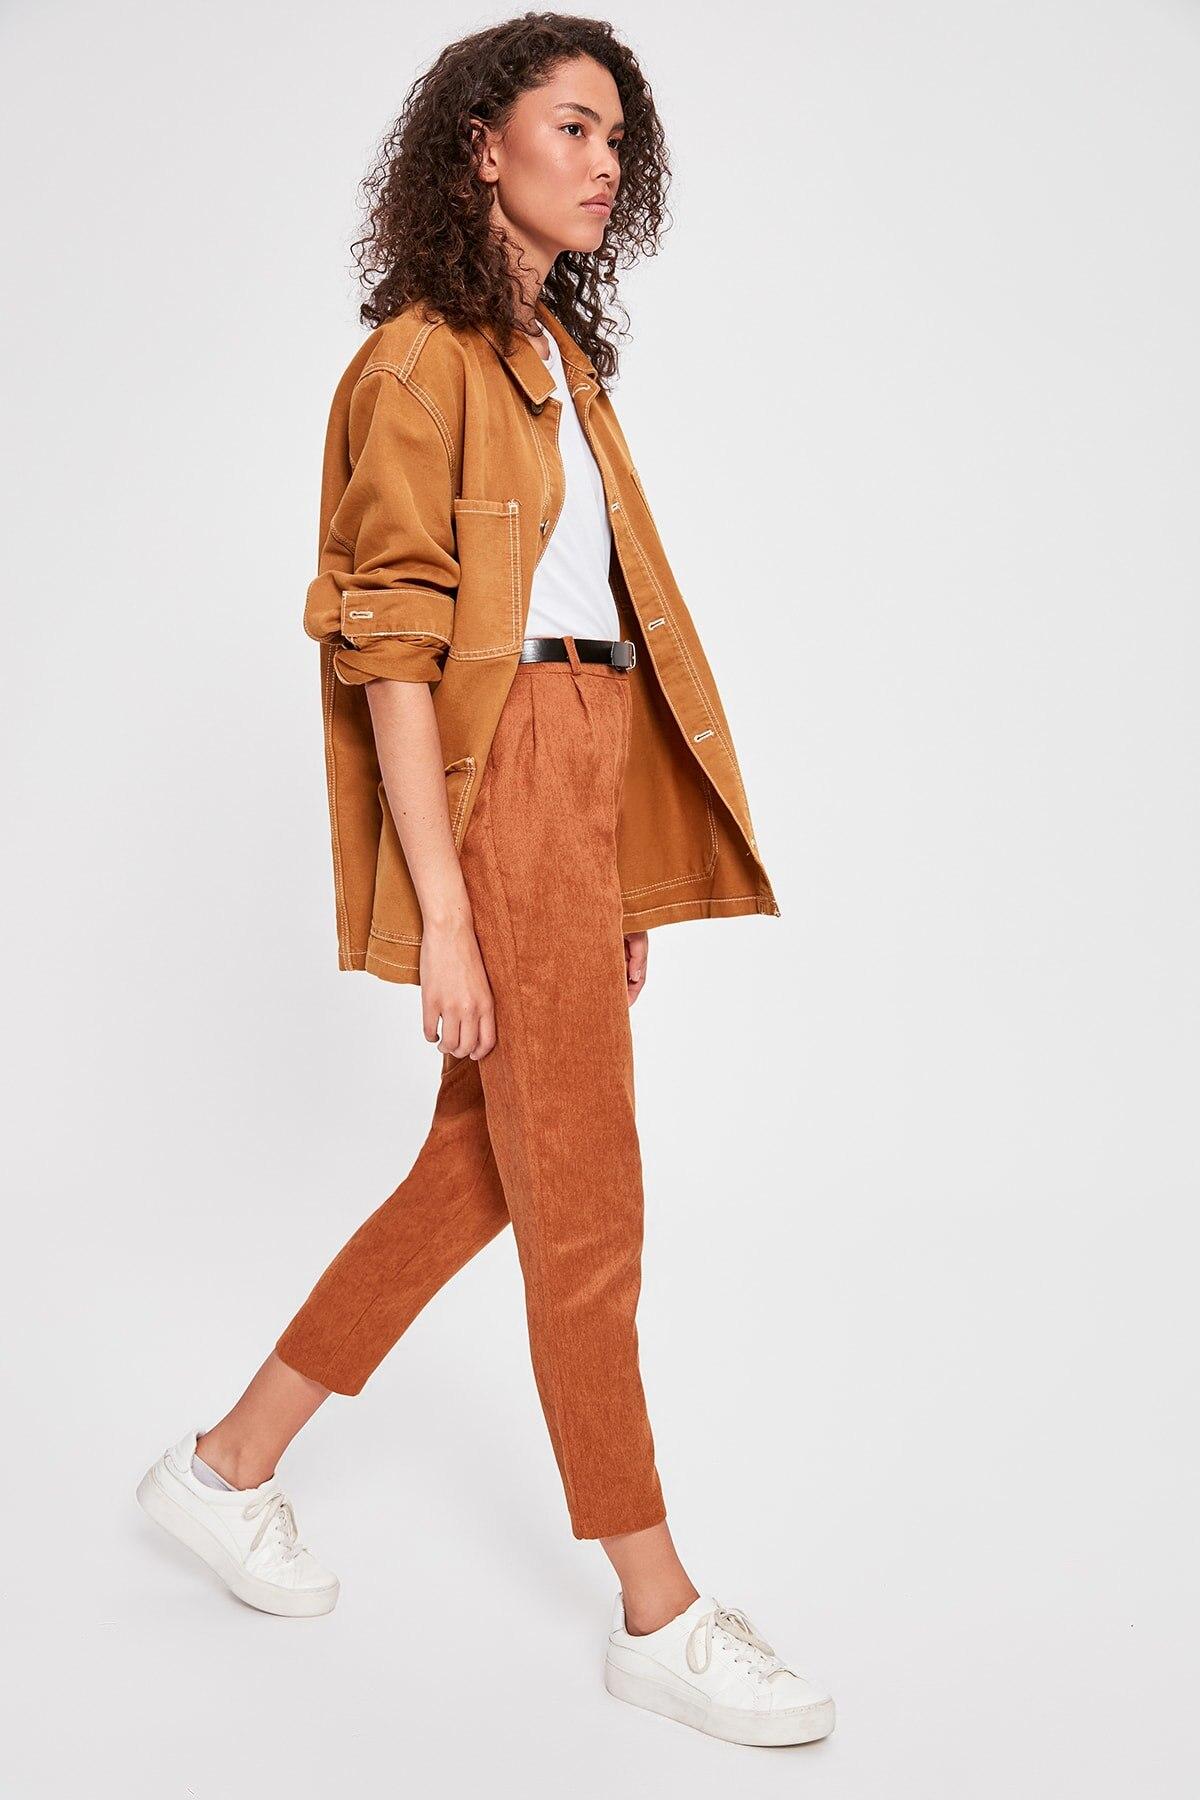 Trendyol Cinnamon Arched Pants TWOAW20PL0307